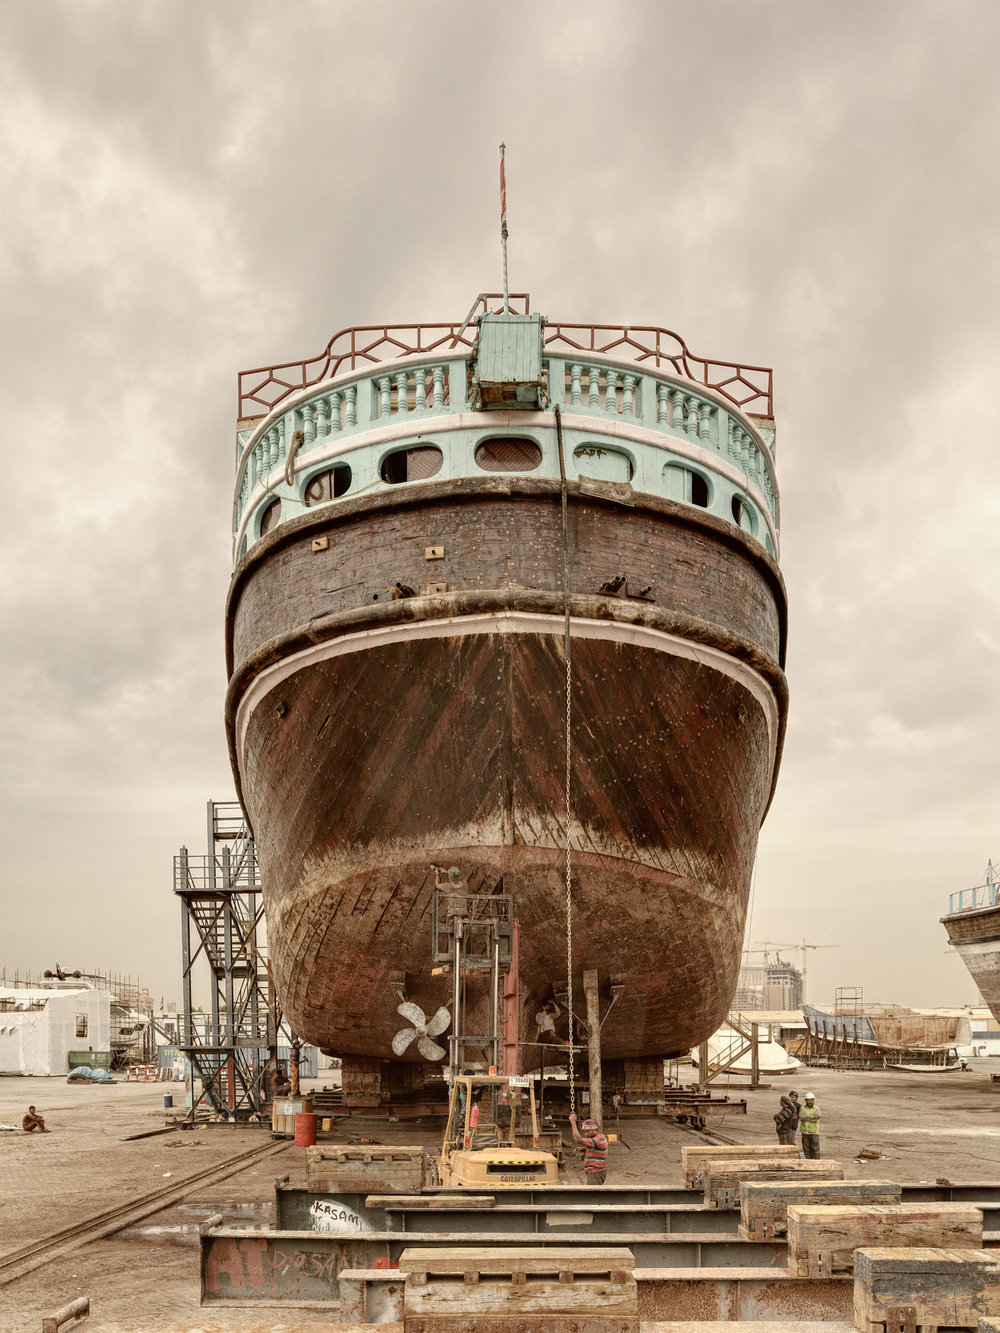 Ship VII - Al Jaddaf Marine Dry Docks - Dubai 2017